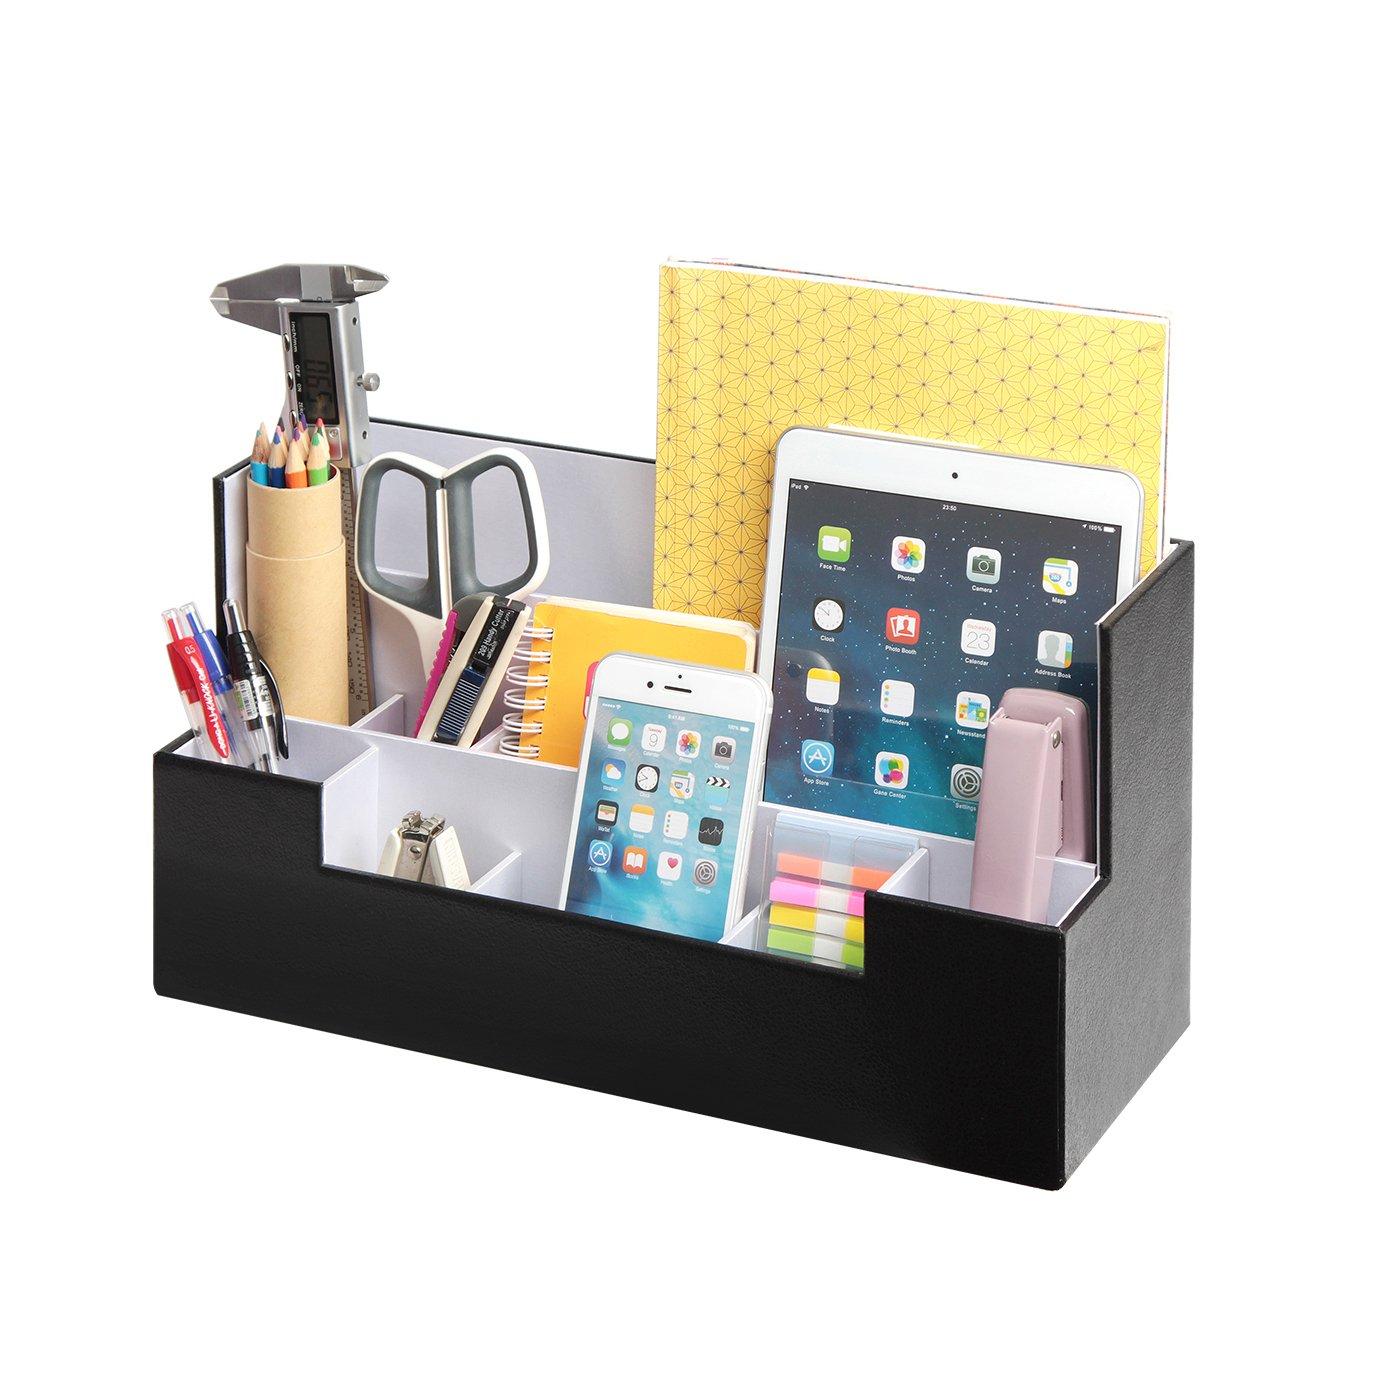 Desk Supplies Office Organizer Caddy (Black, 13.4 x 5.1 x 7.1 inches) JackCubeDesign-:MK268A